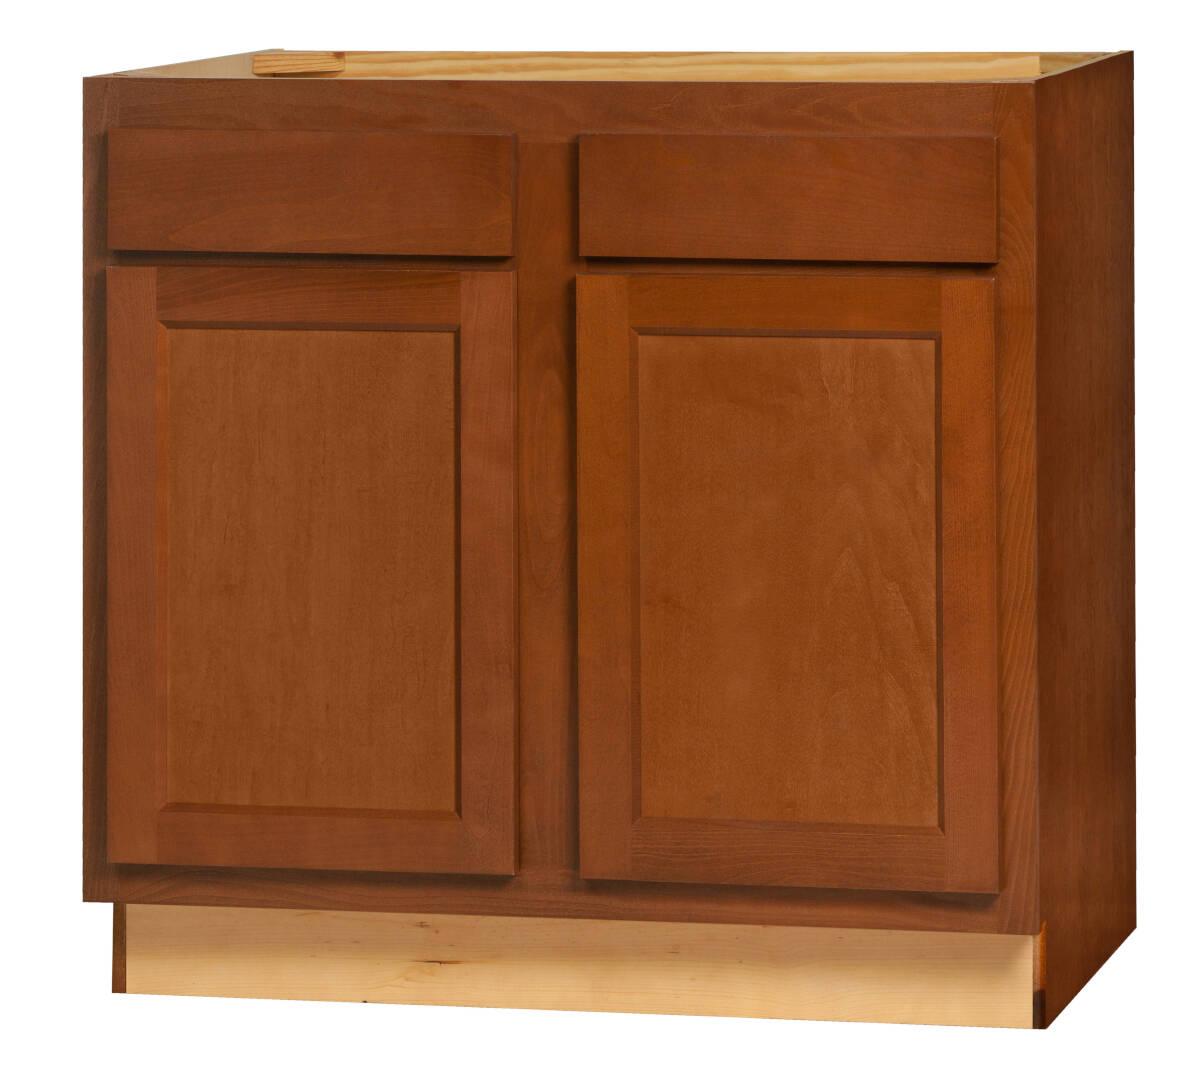 36 x 34 1 2 x 24 inch glenwood dark chocolate range and sink base cabinet